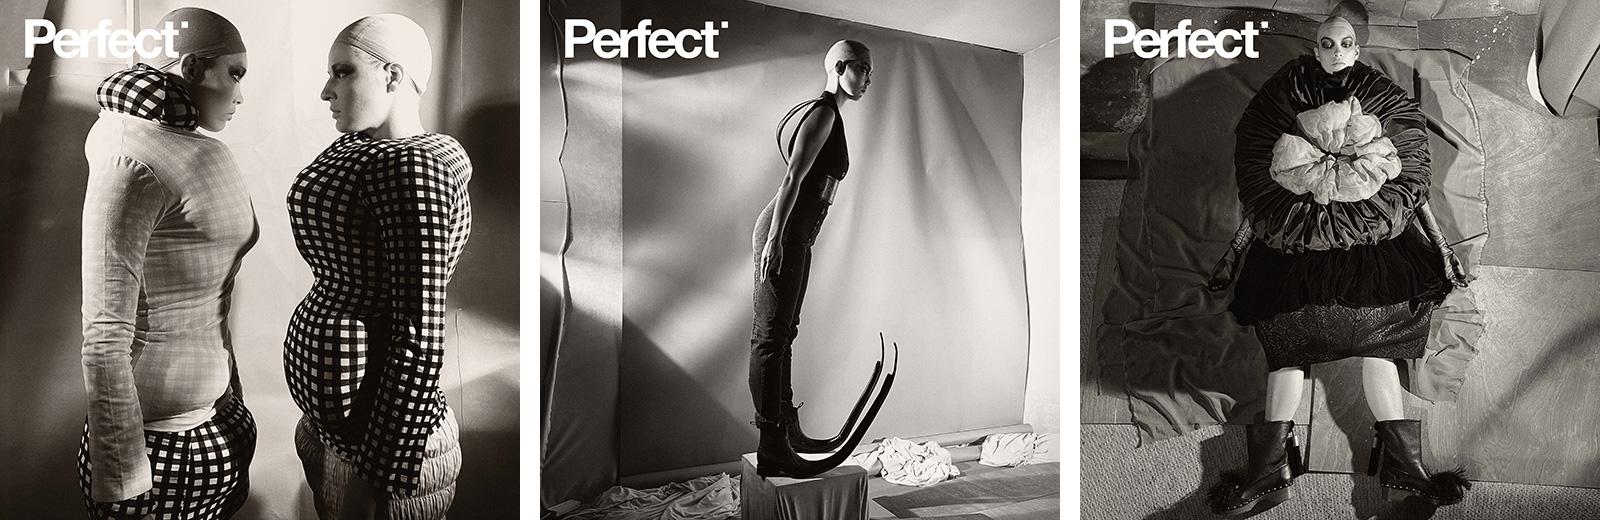 Perfect Magazine